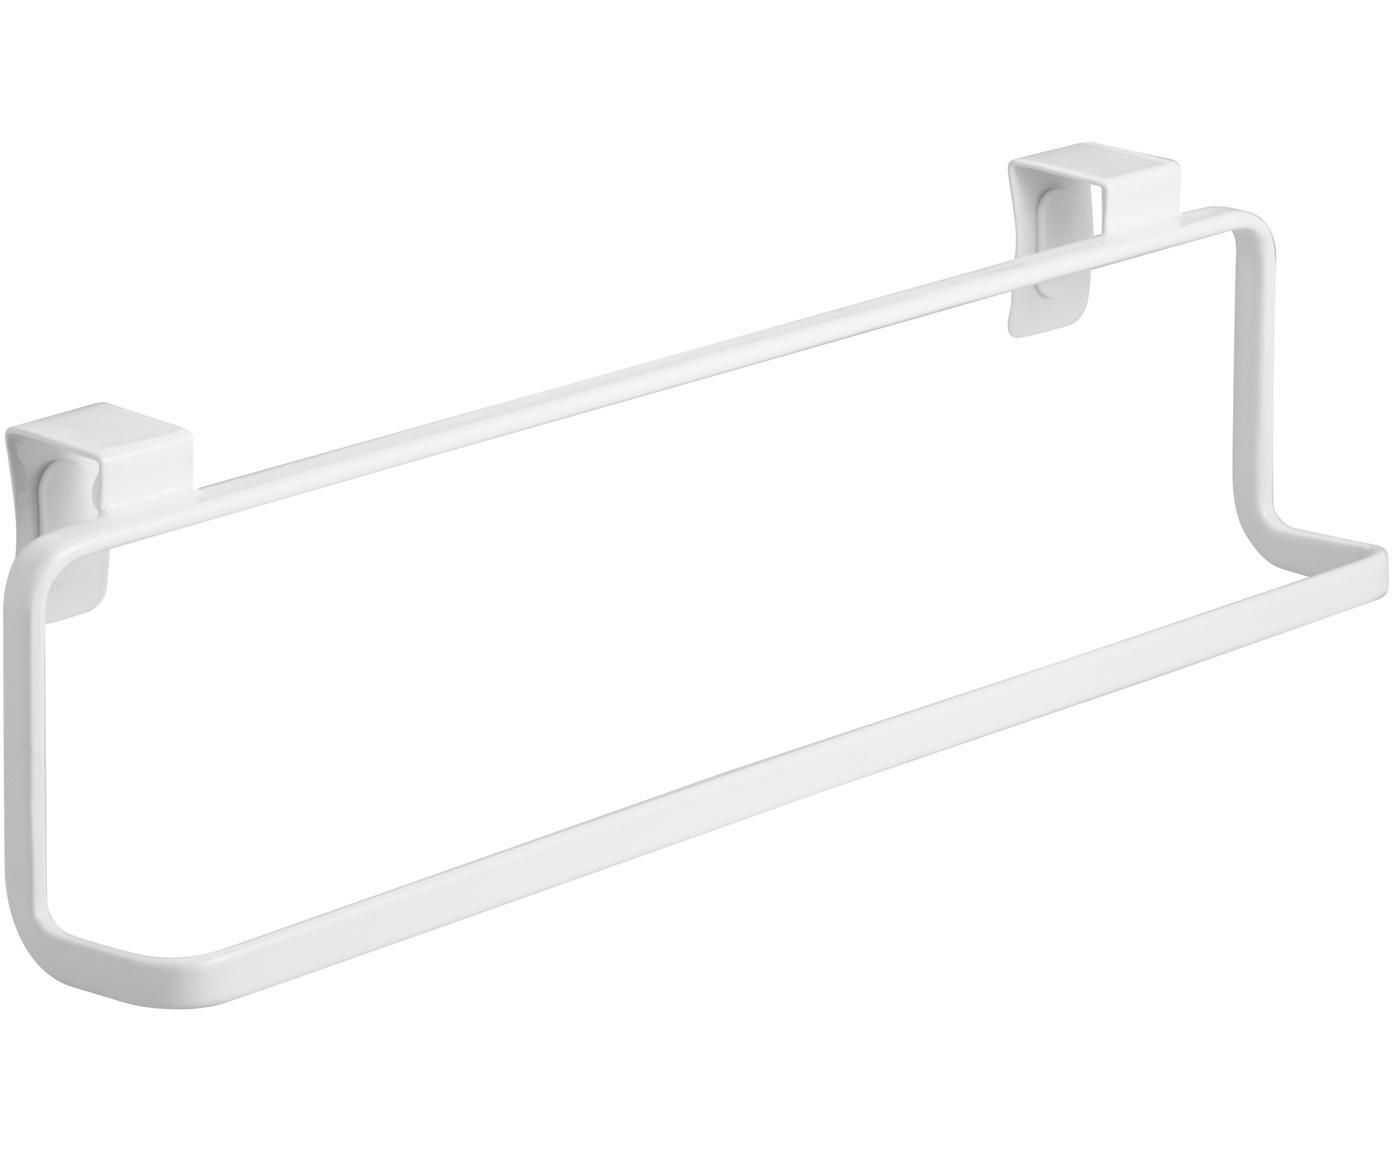 Toallero Torre, Acero, recubierto, Blanco, An 30 x Al 8 cm